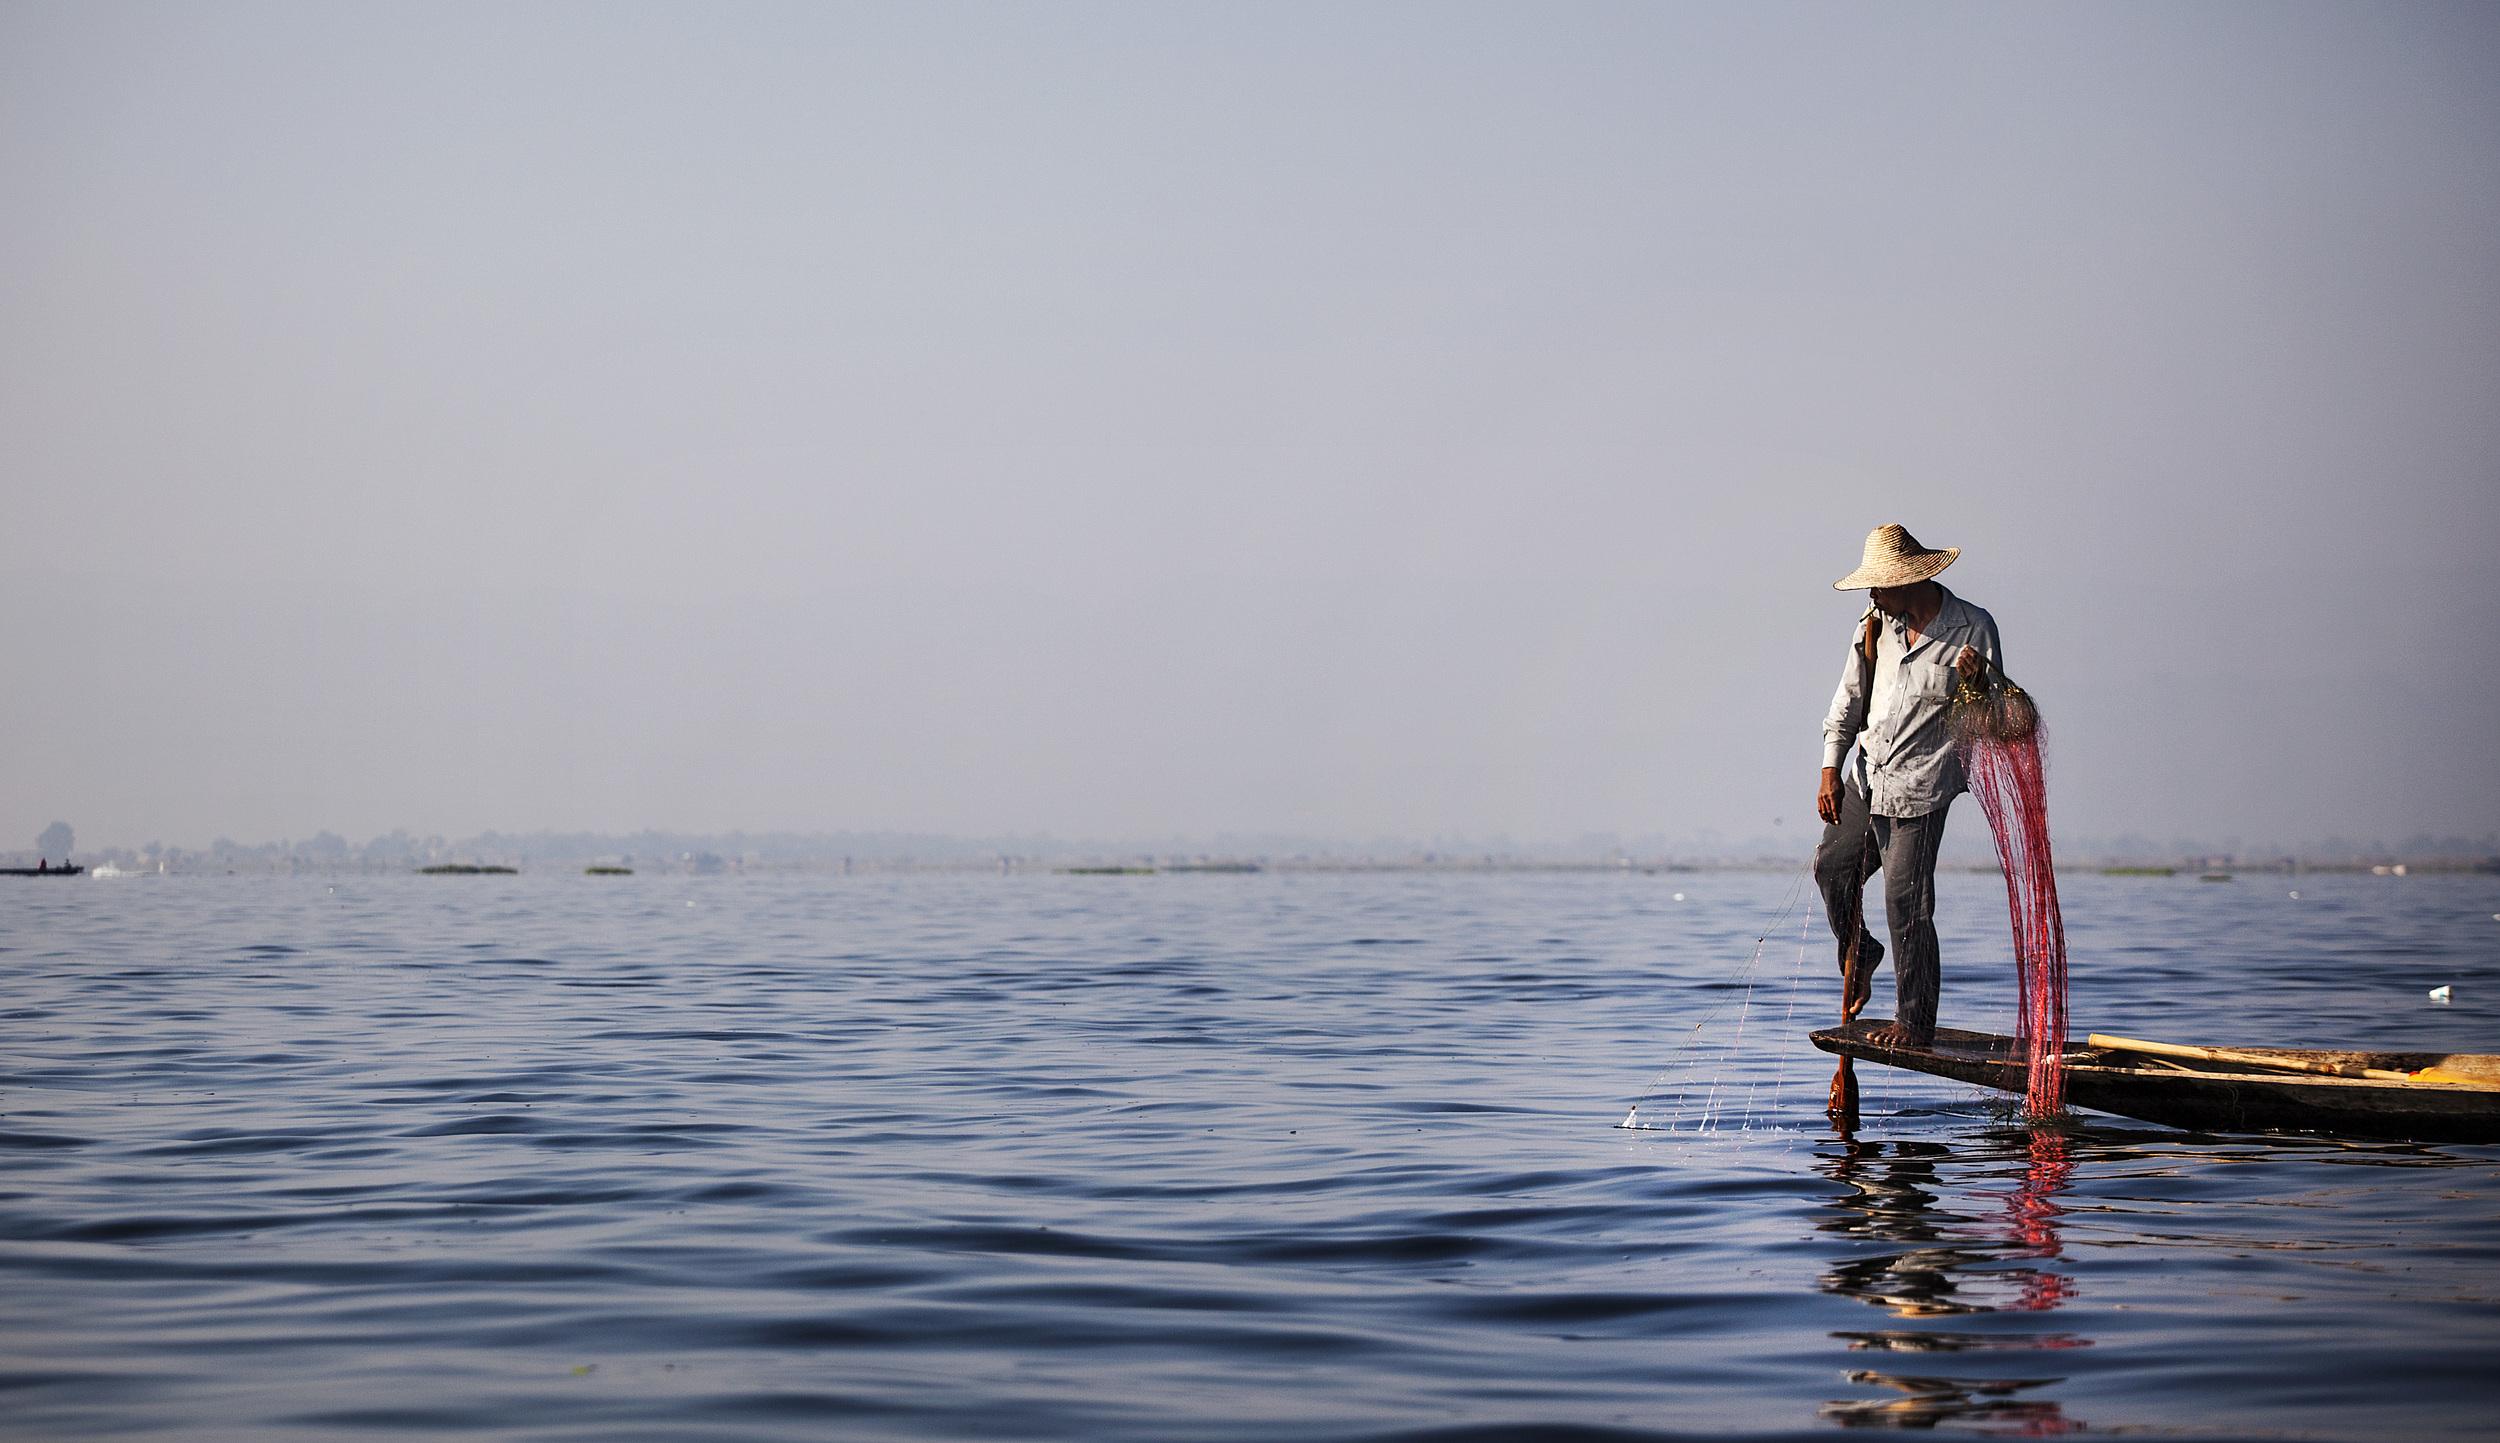 fisherman using the distinctive one legged paddling technique